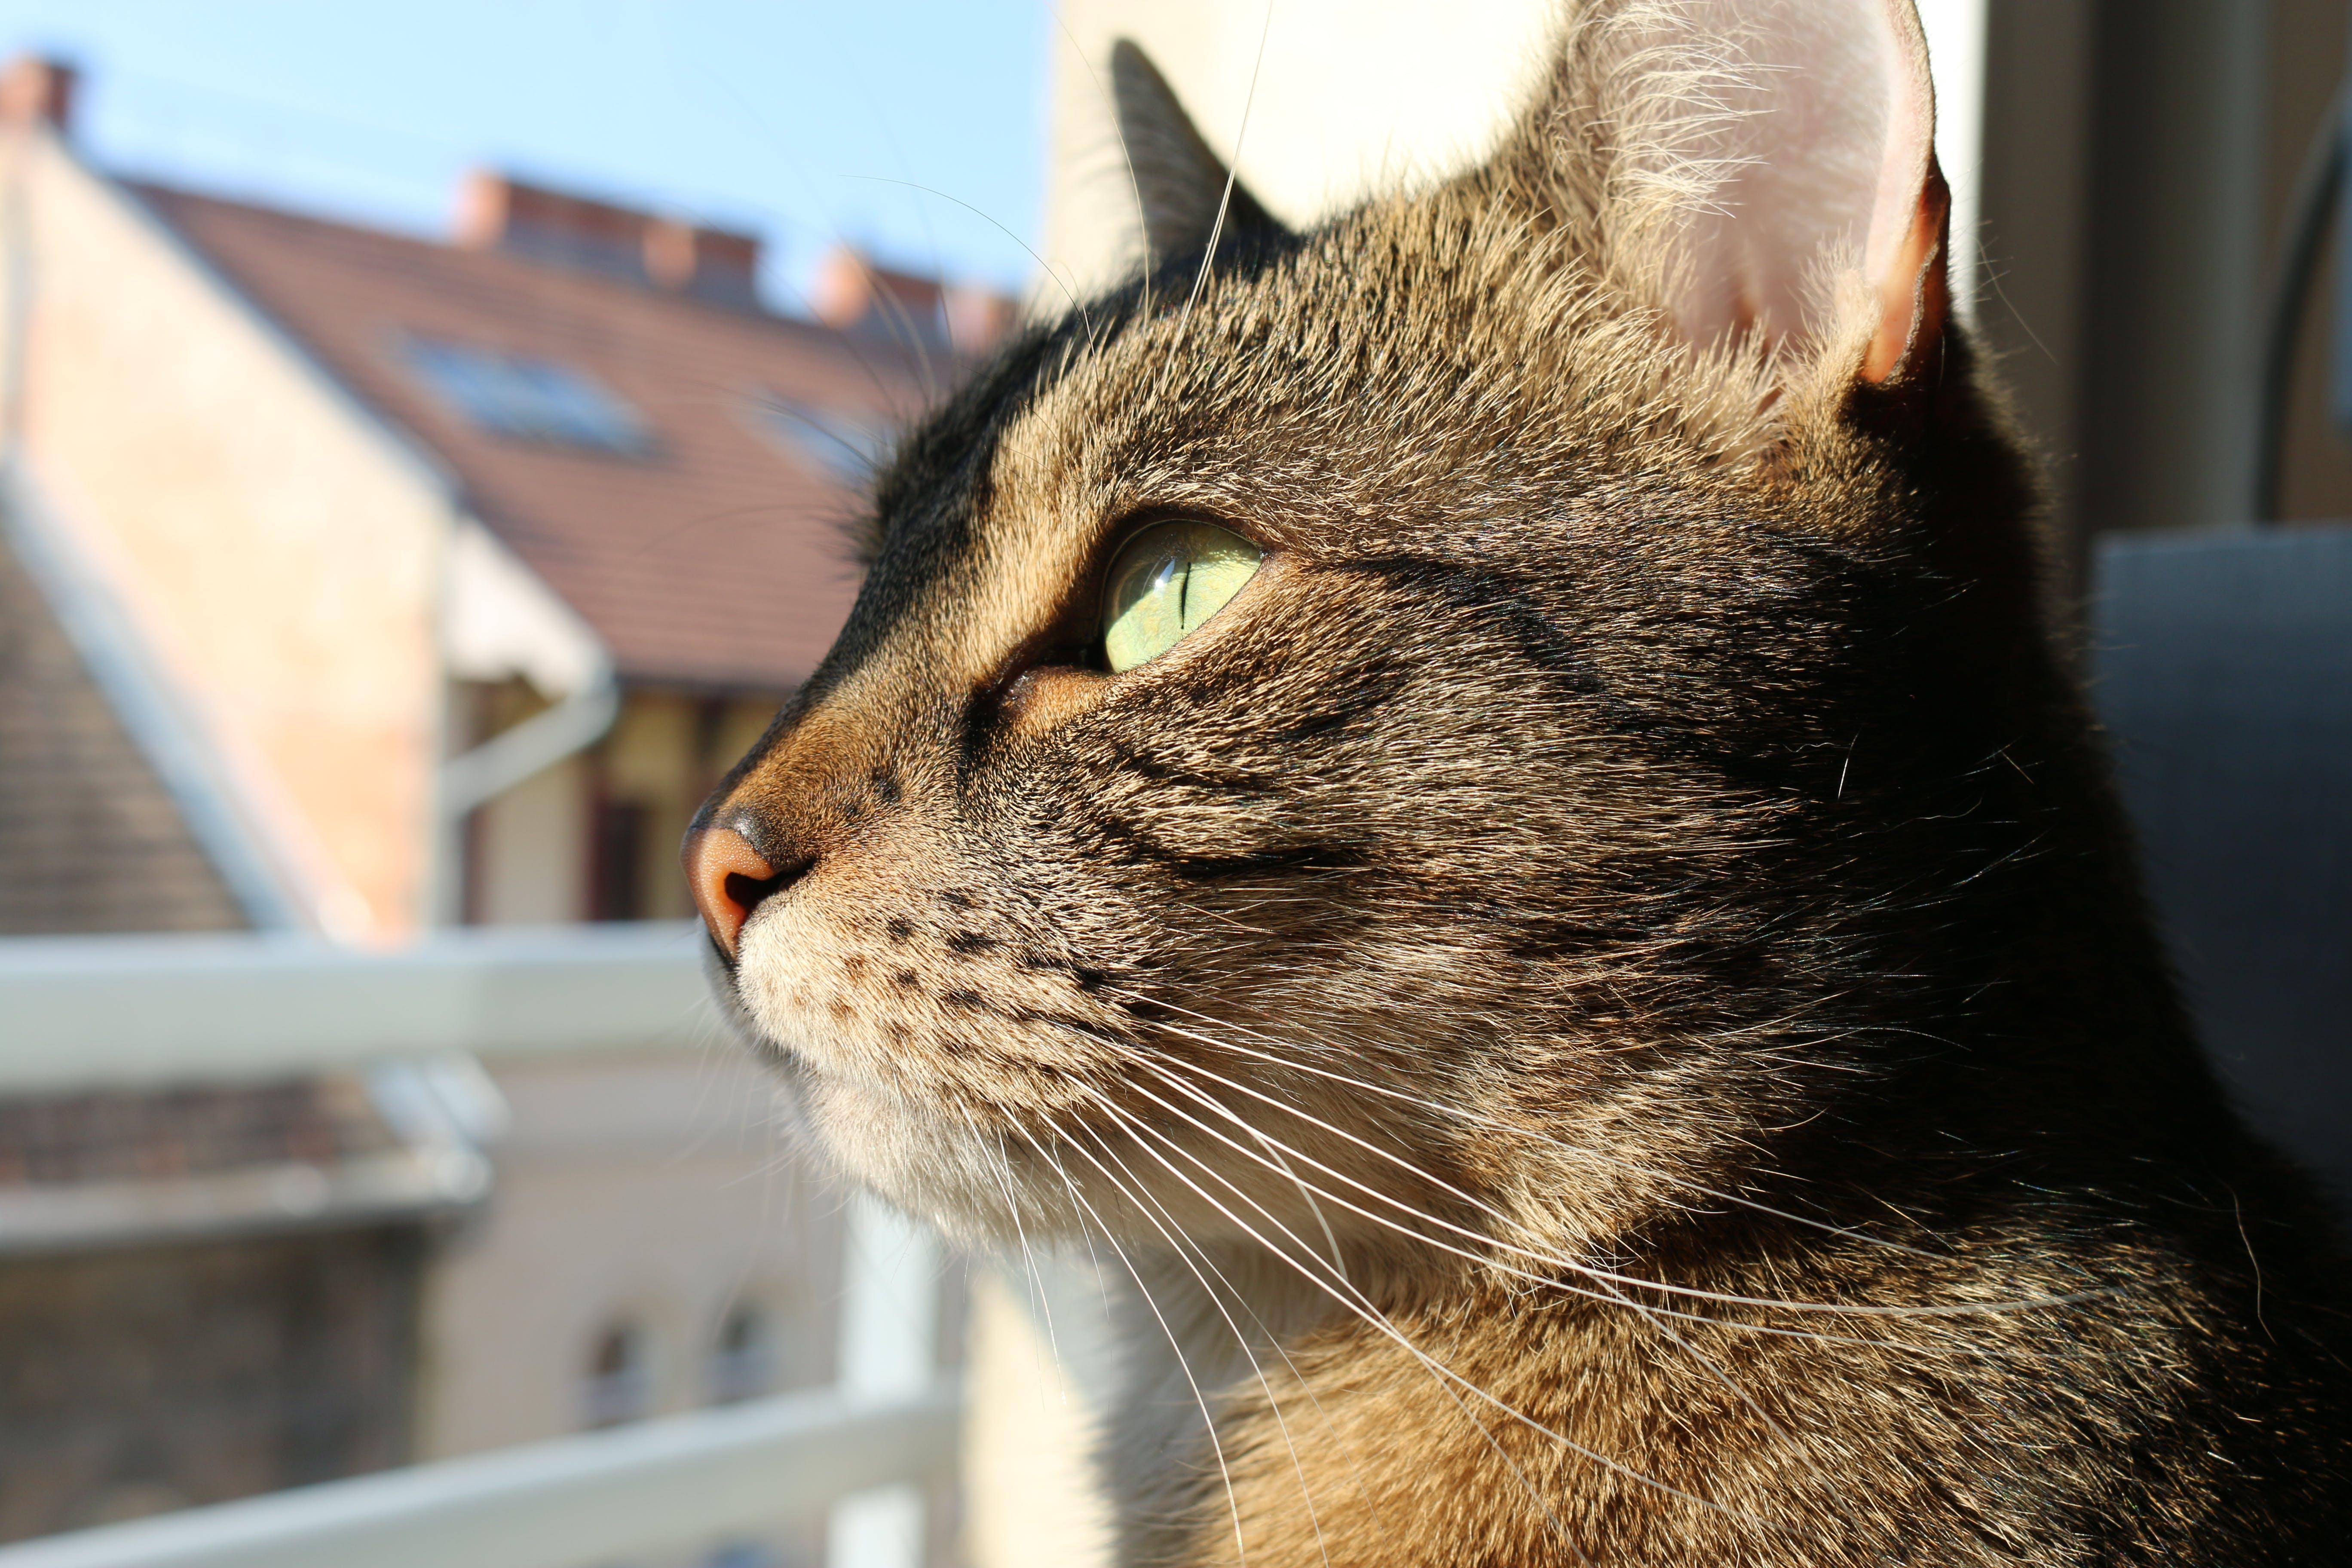 Free stock photo of animal, cat, cats, city